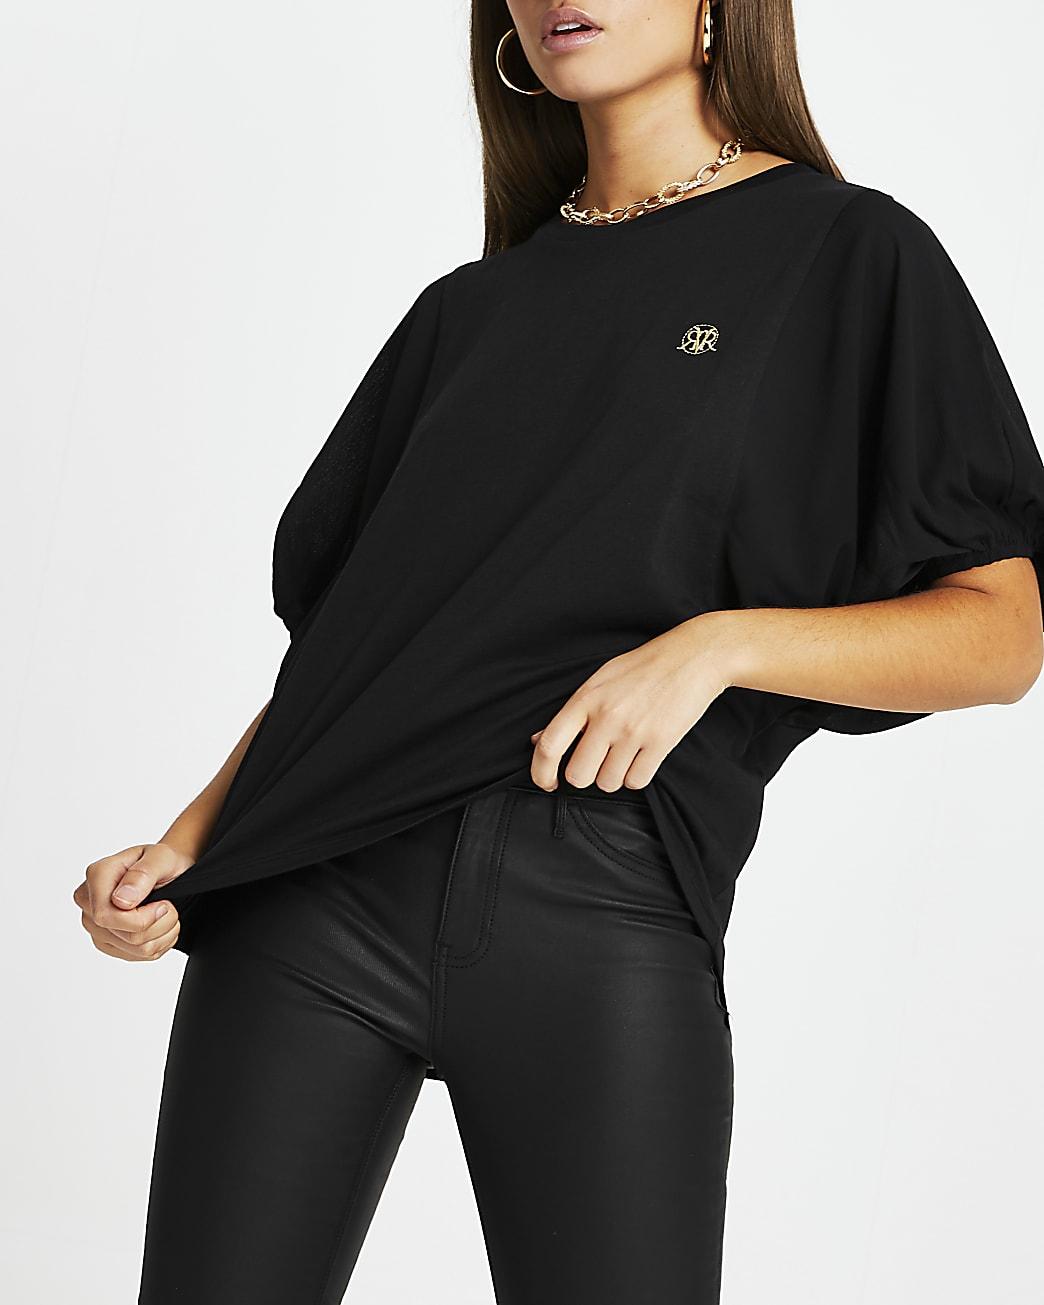 Black RI batwing balloon sleeve top